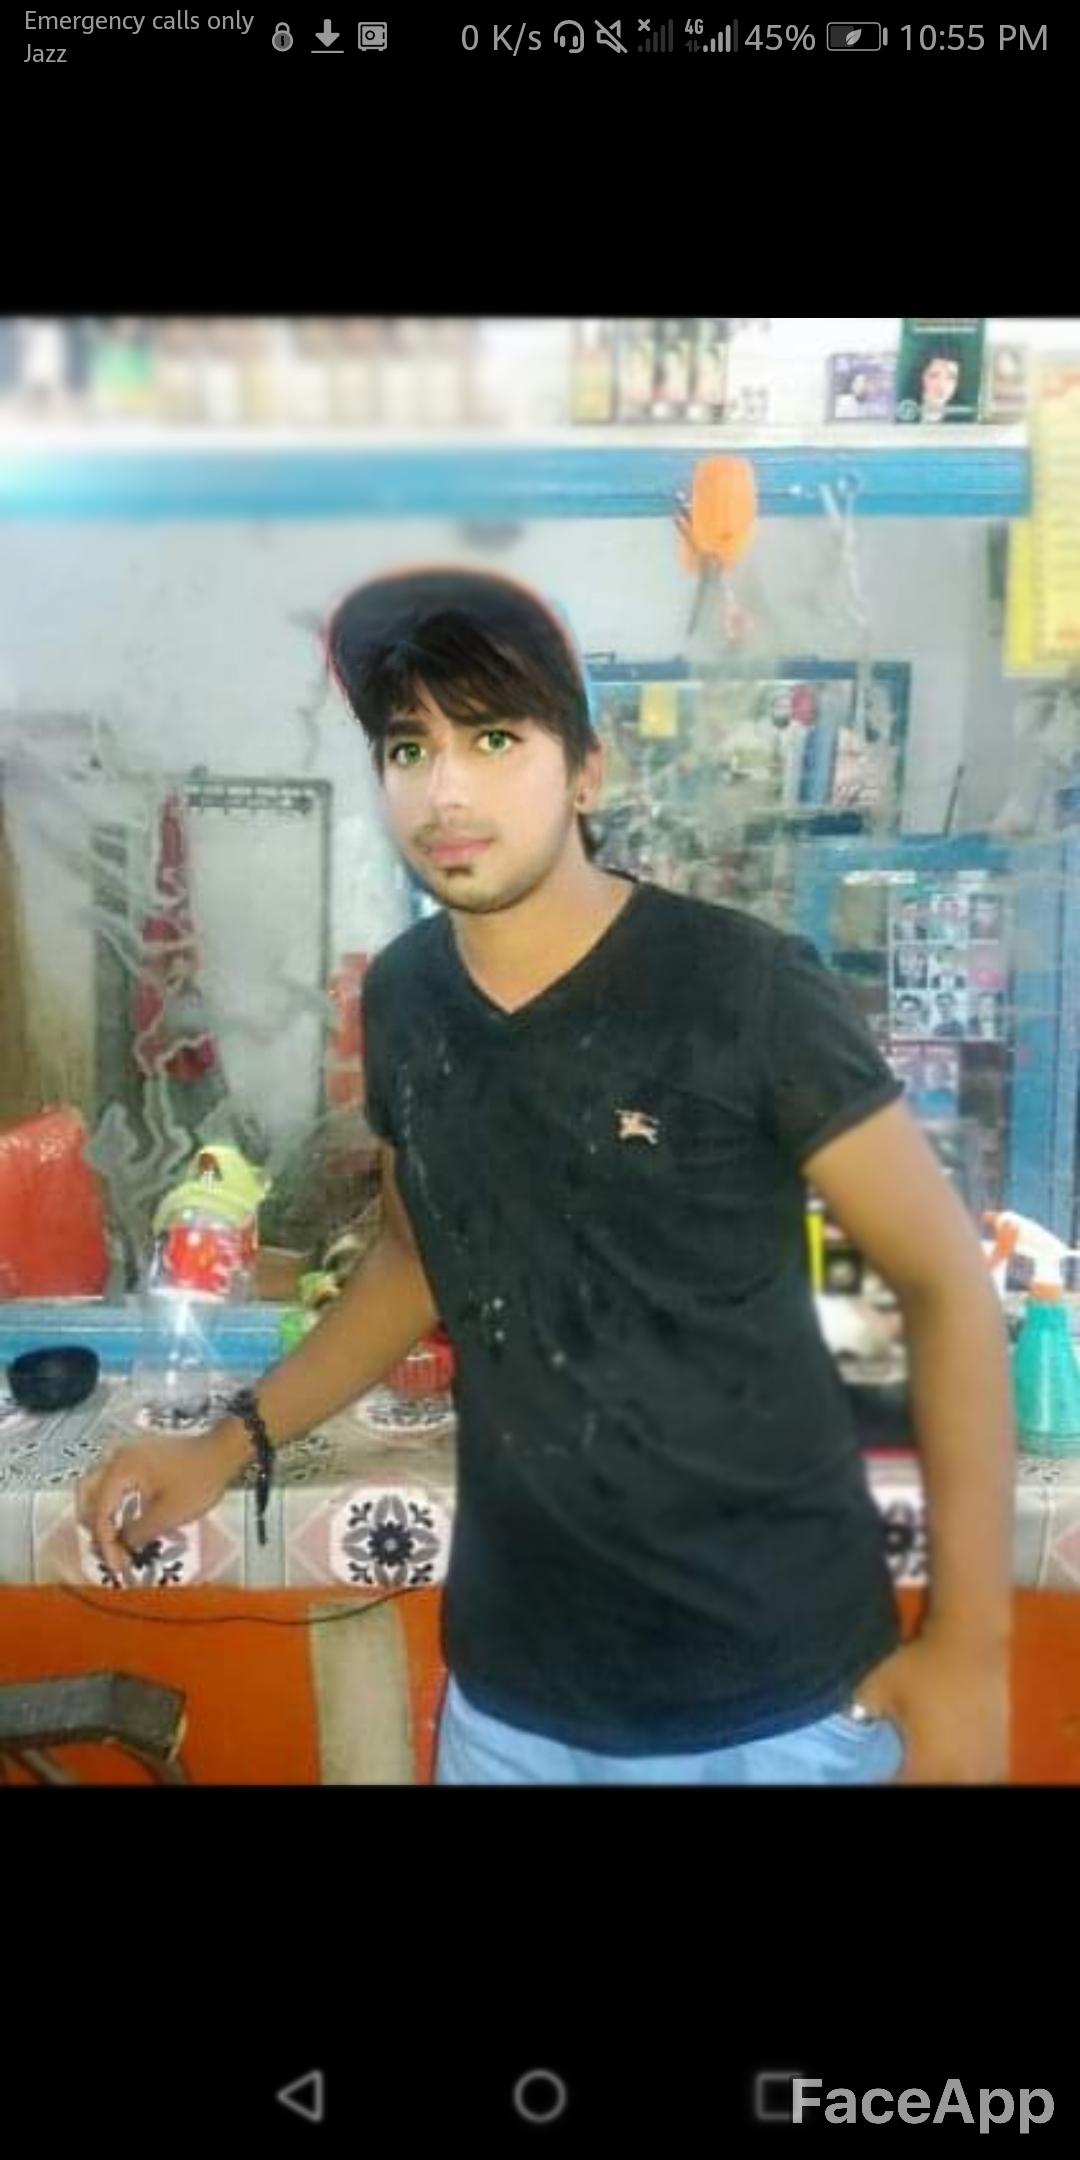 Muhammad Babar